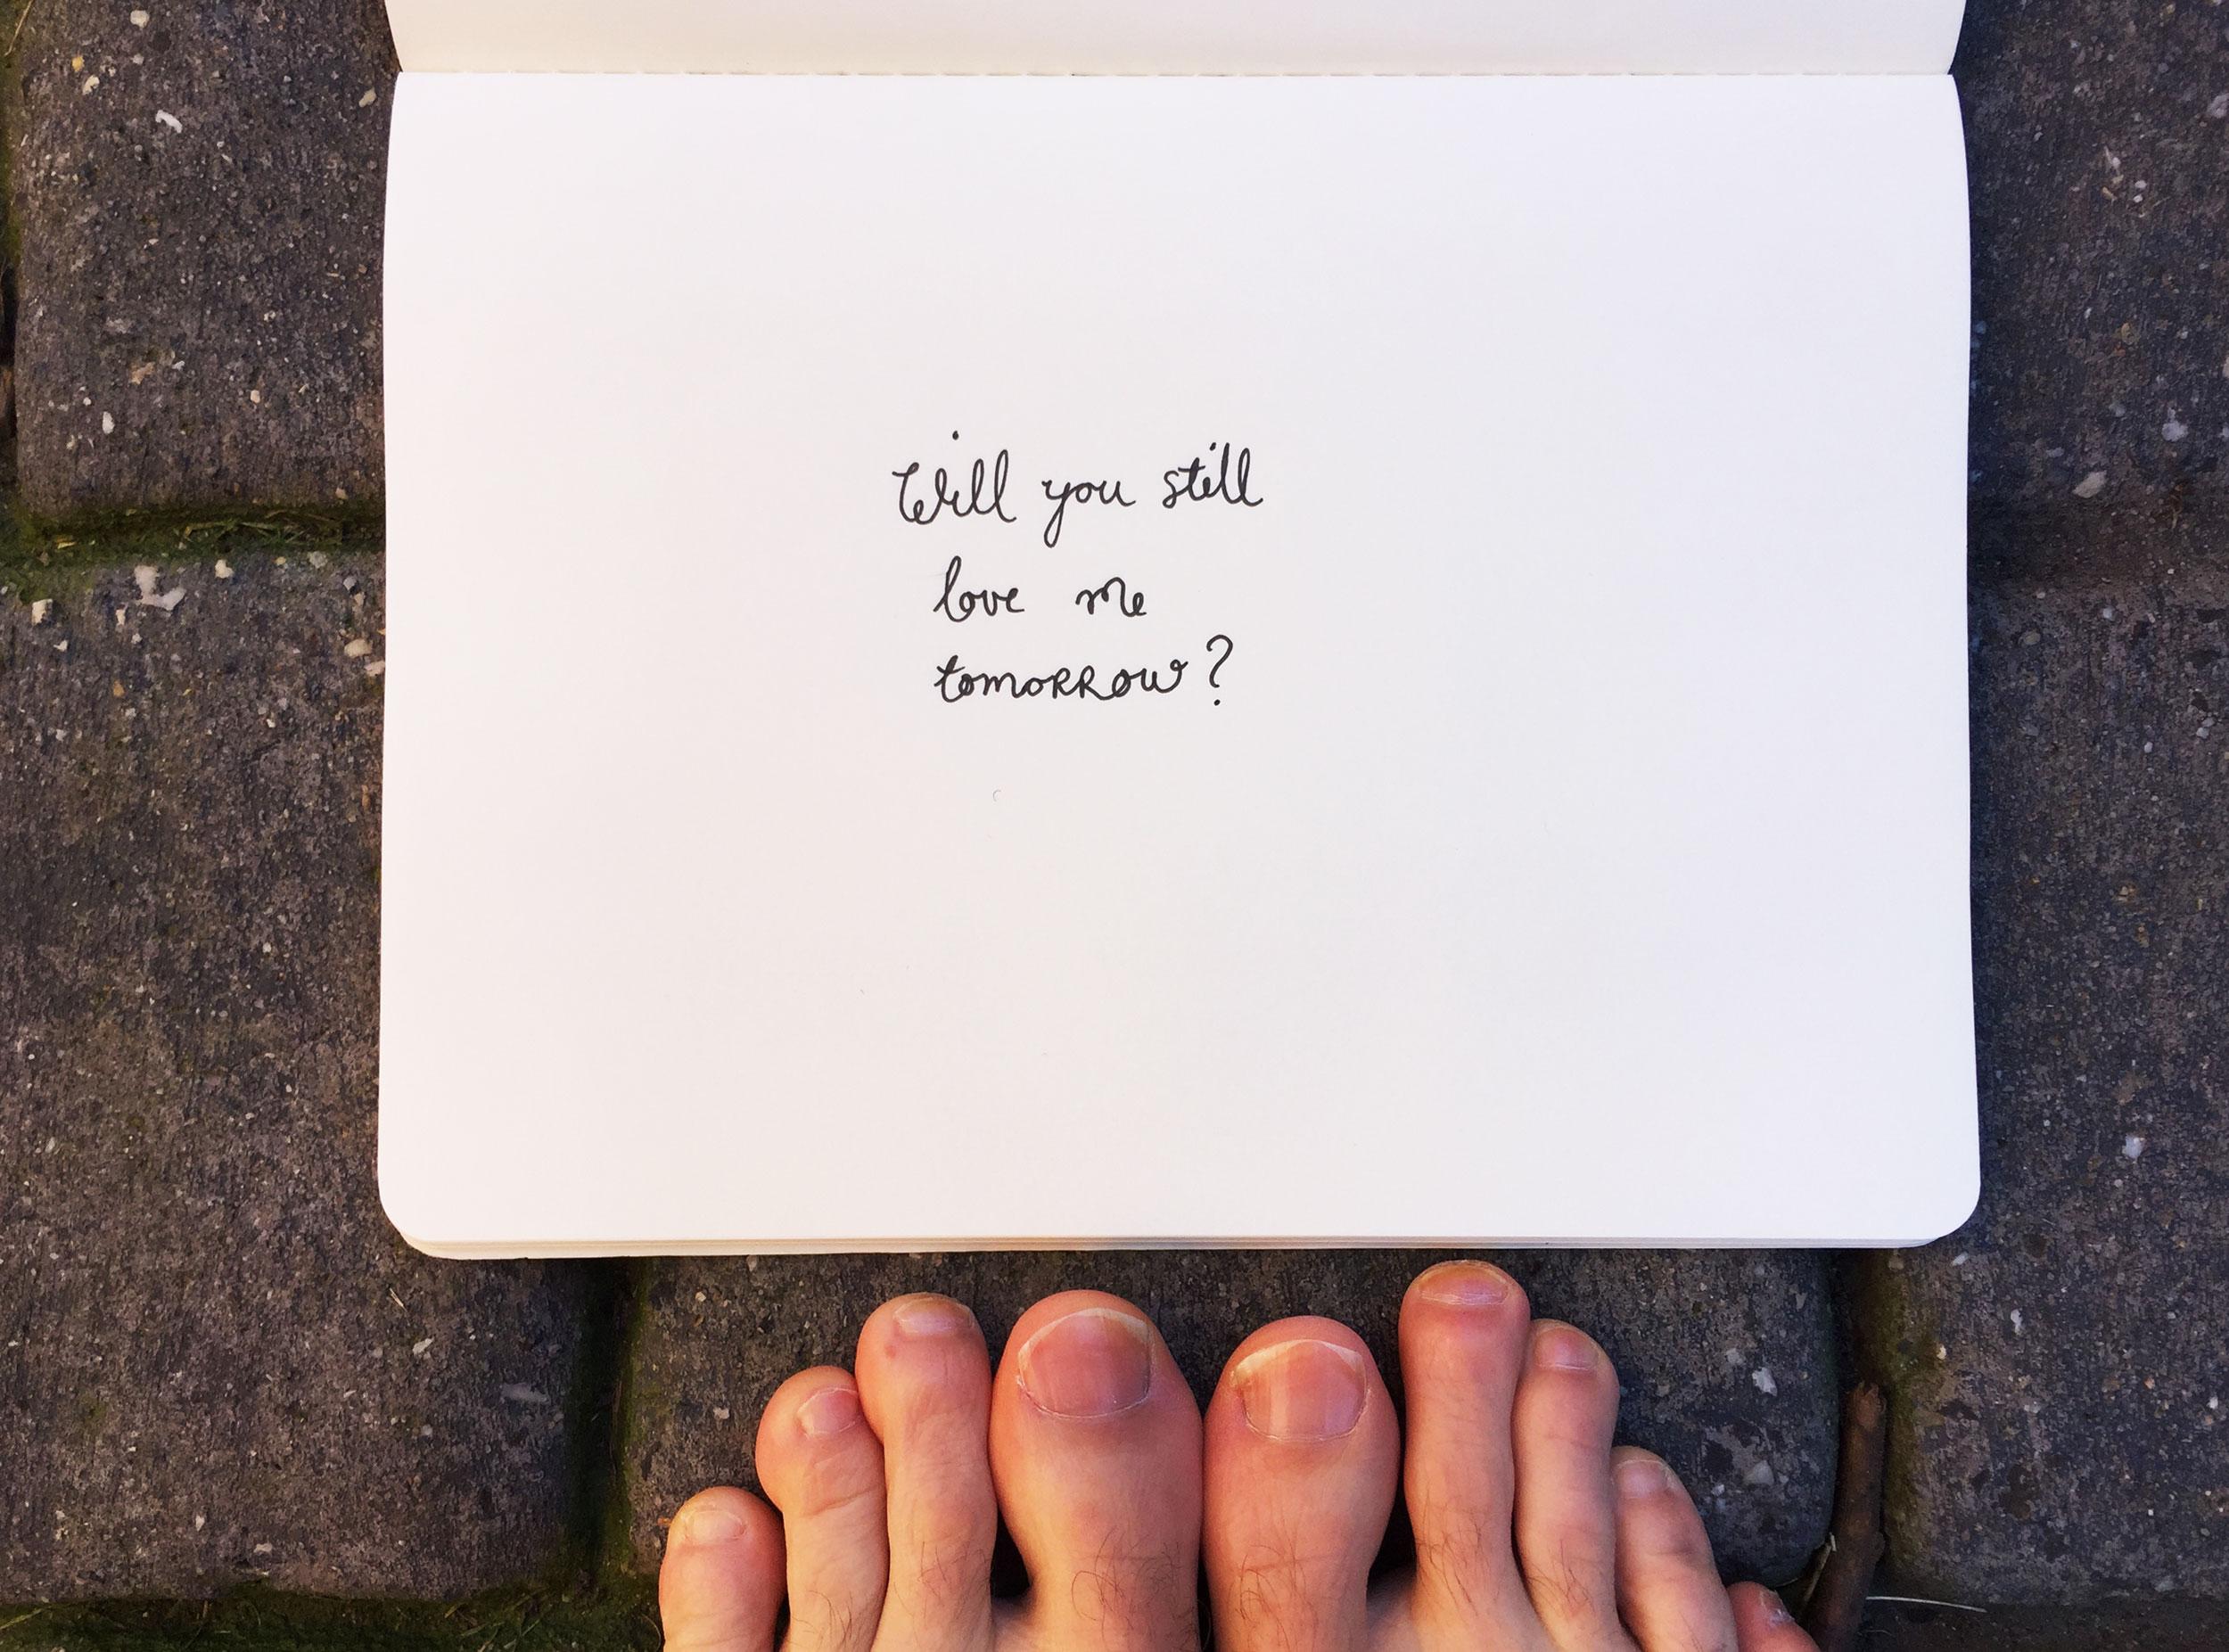 Will you still love me tomorrow? Drawing Luke Hockley.